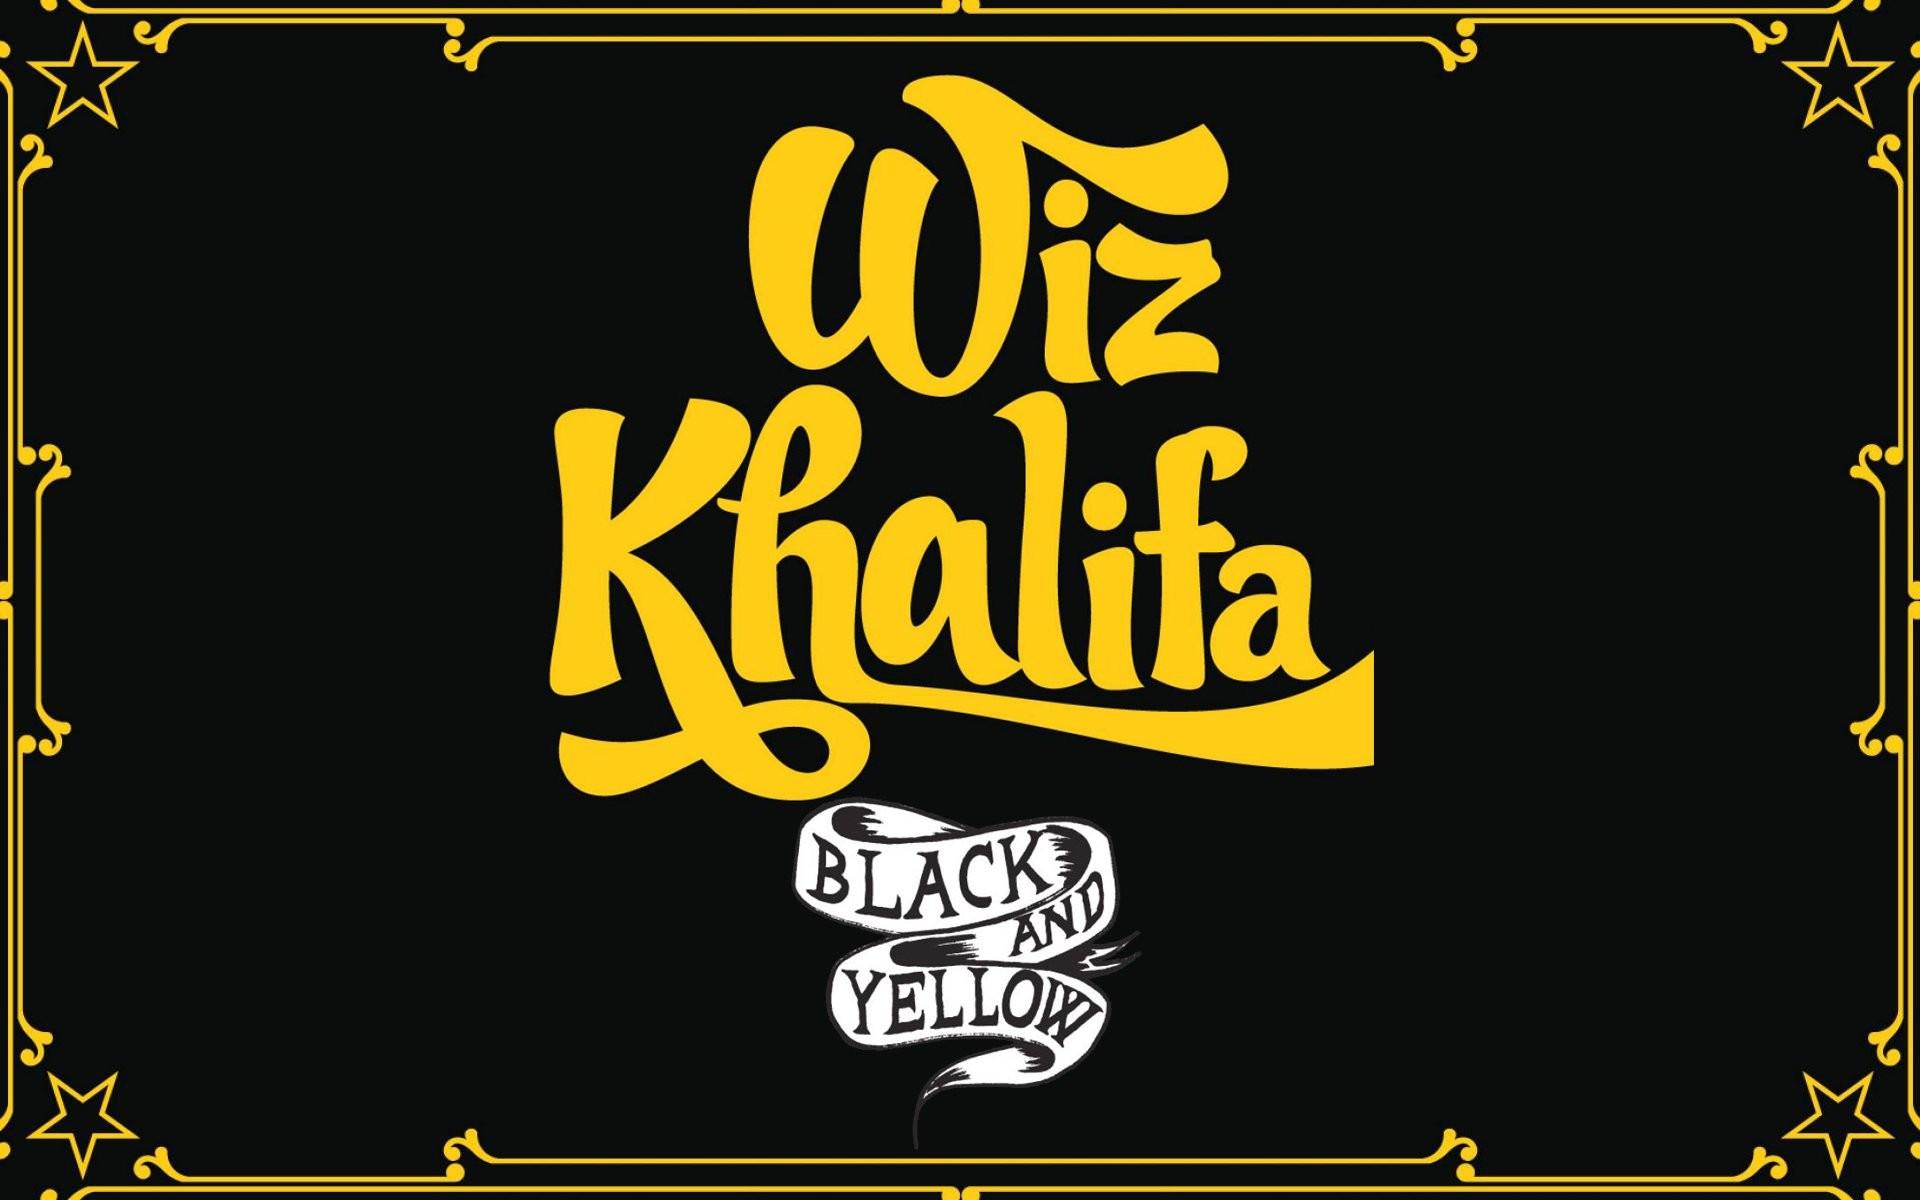 1920x1080 Speed Art Wiz Khalifa Basic Wallpaper